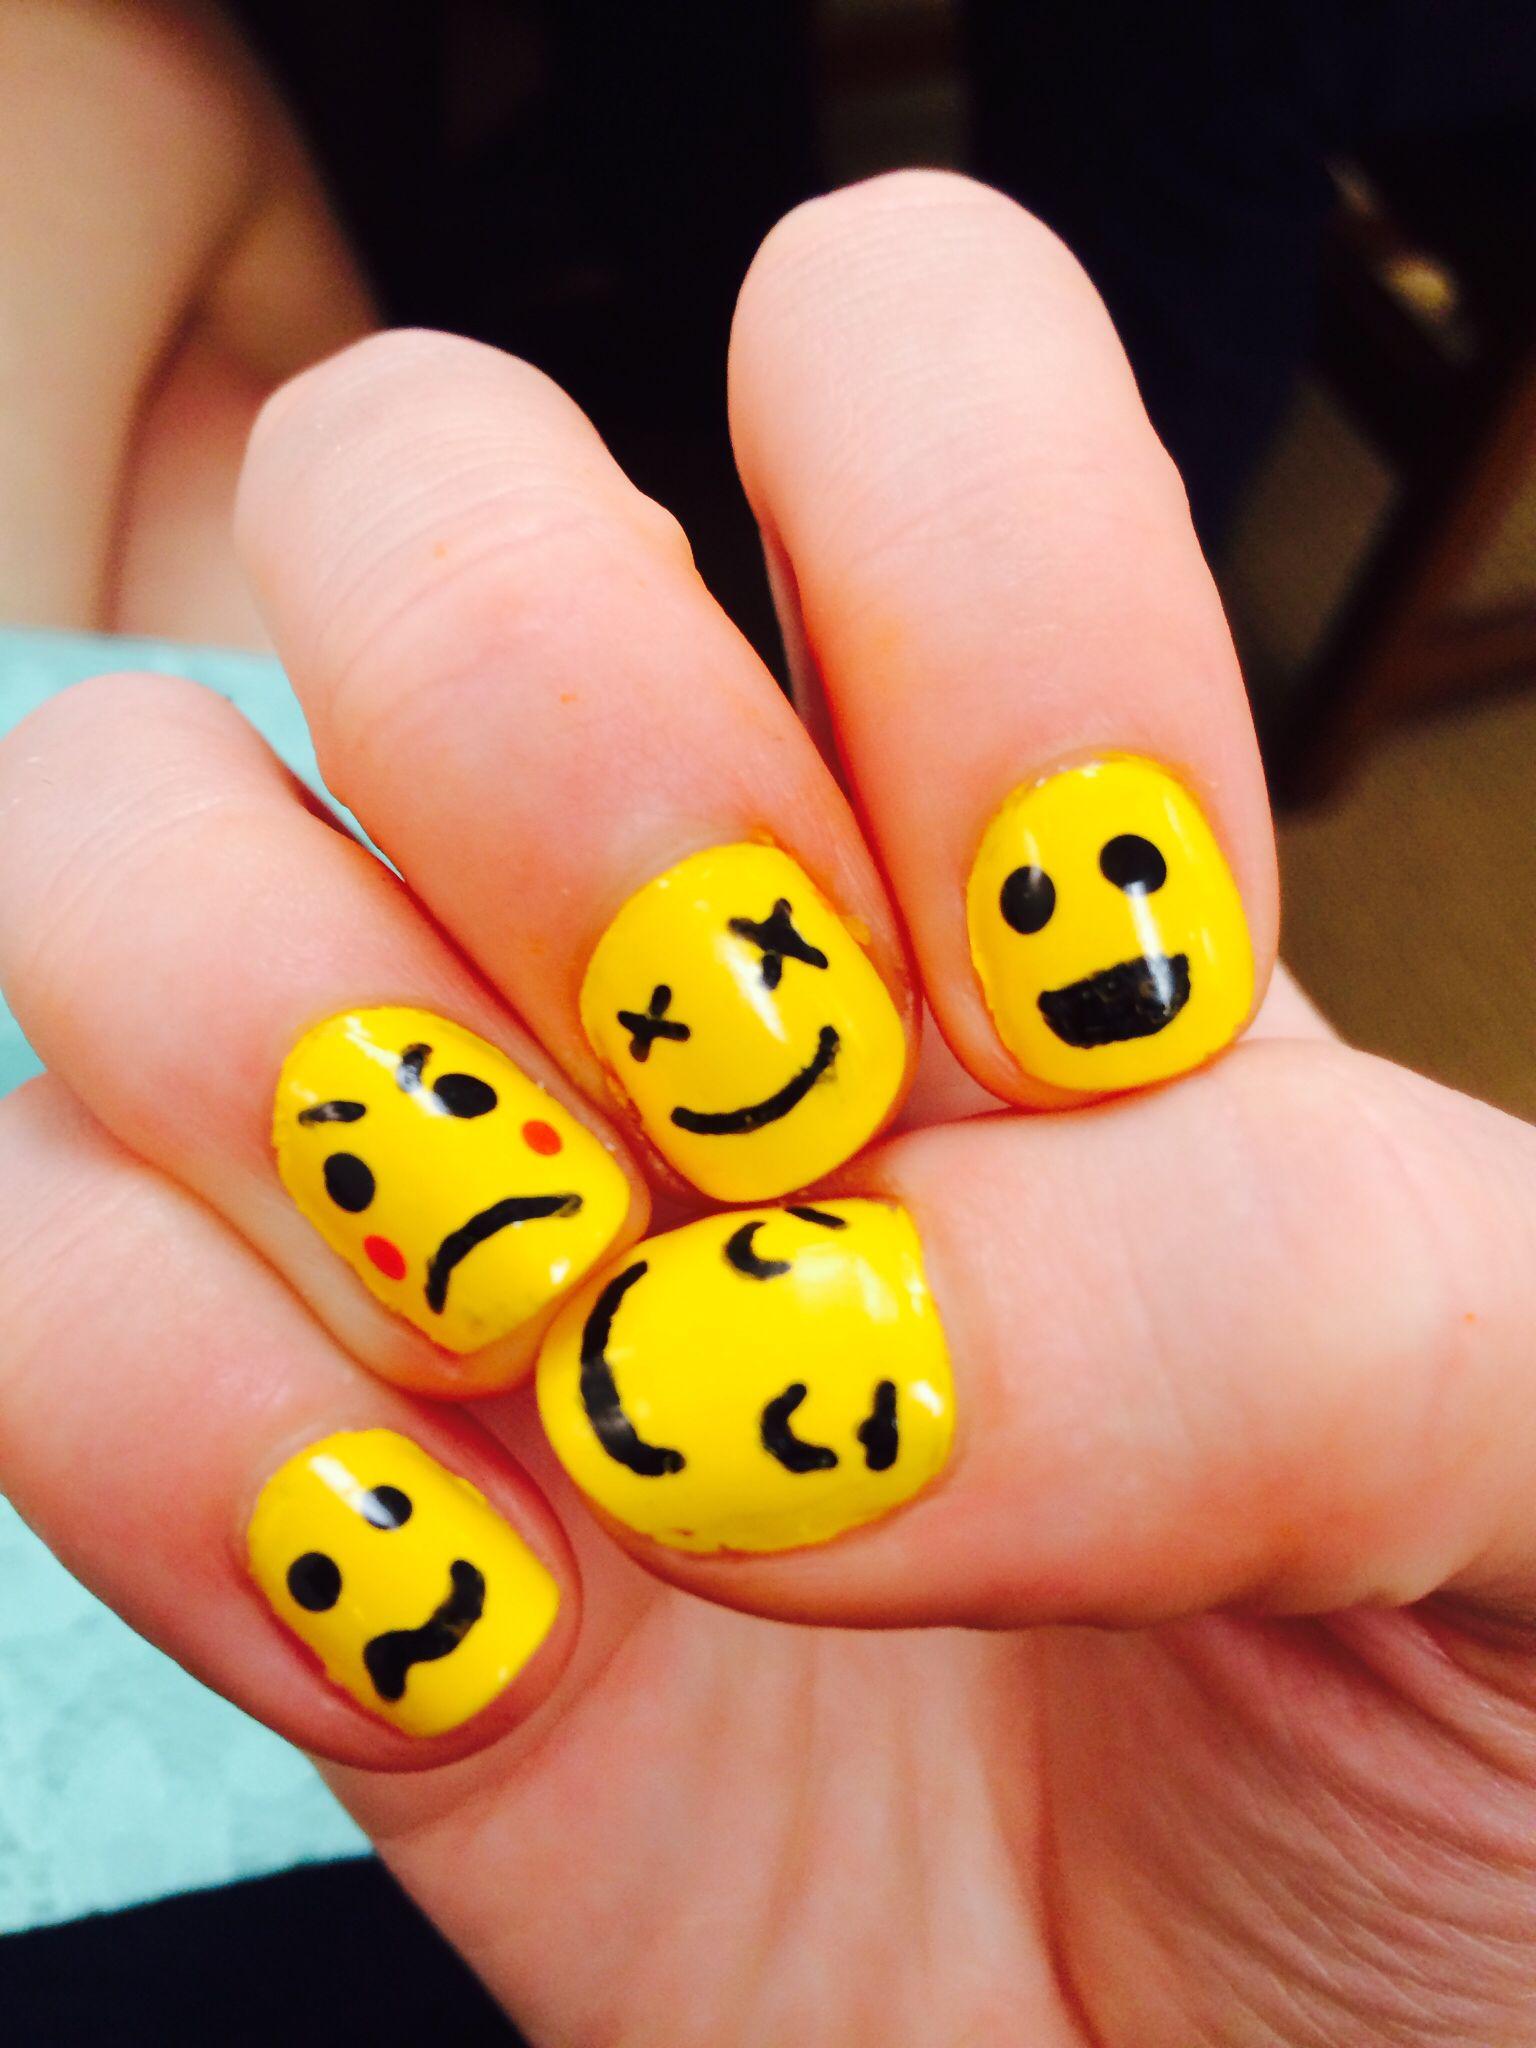 Emoji nail art the other hand | My magical nail art | Pinterest ...